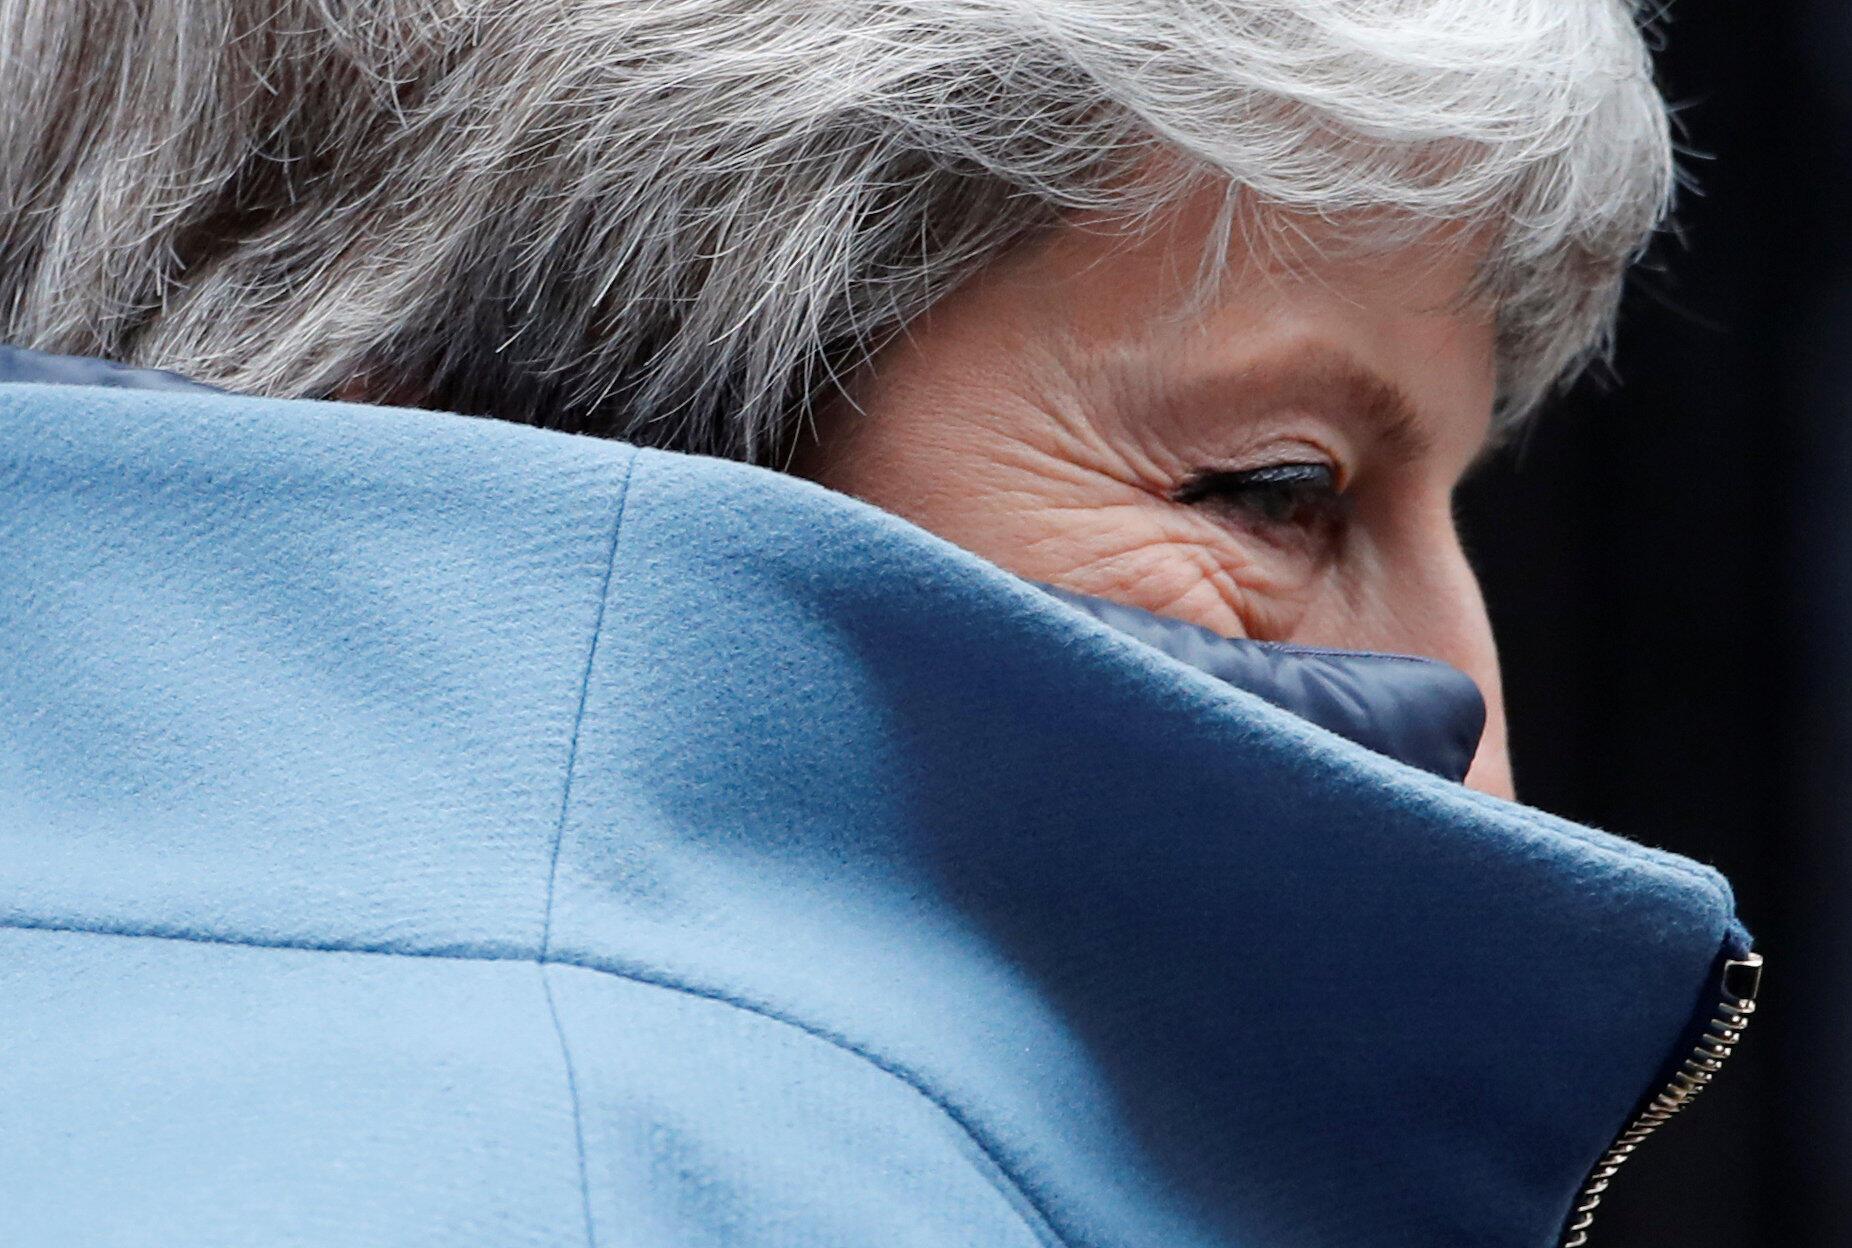 La Première ministre britannique Theresa May, quittant le 10 Downing Street, le 27 mars.